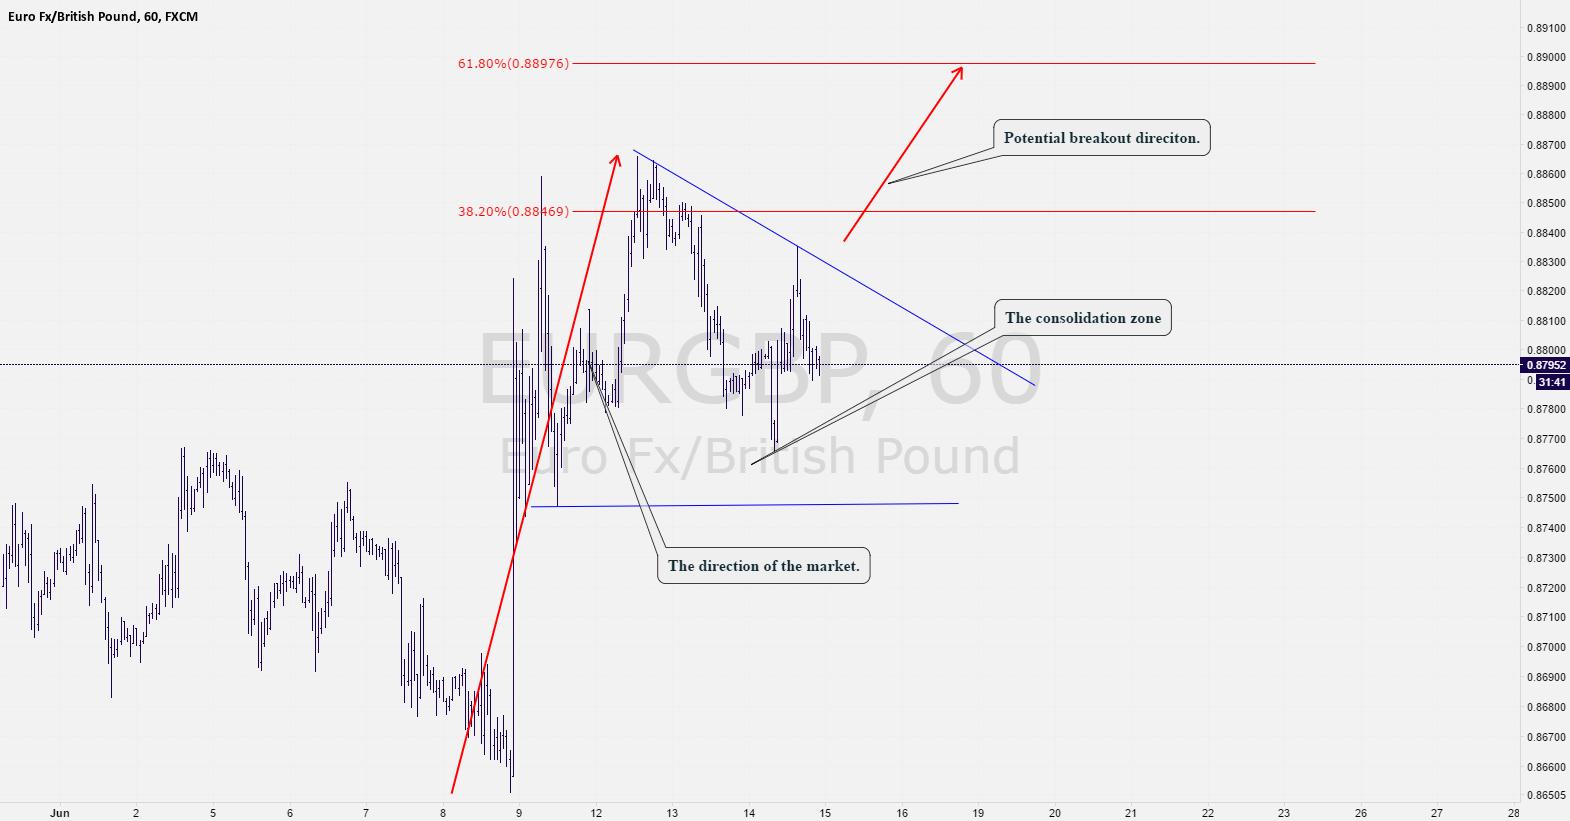 EurGbp: Potential bullish breakout possibility